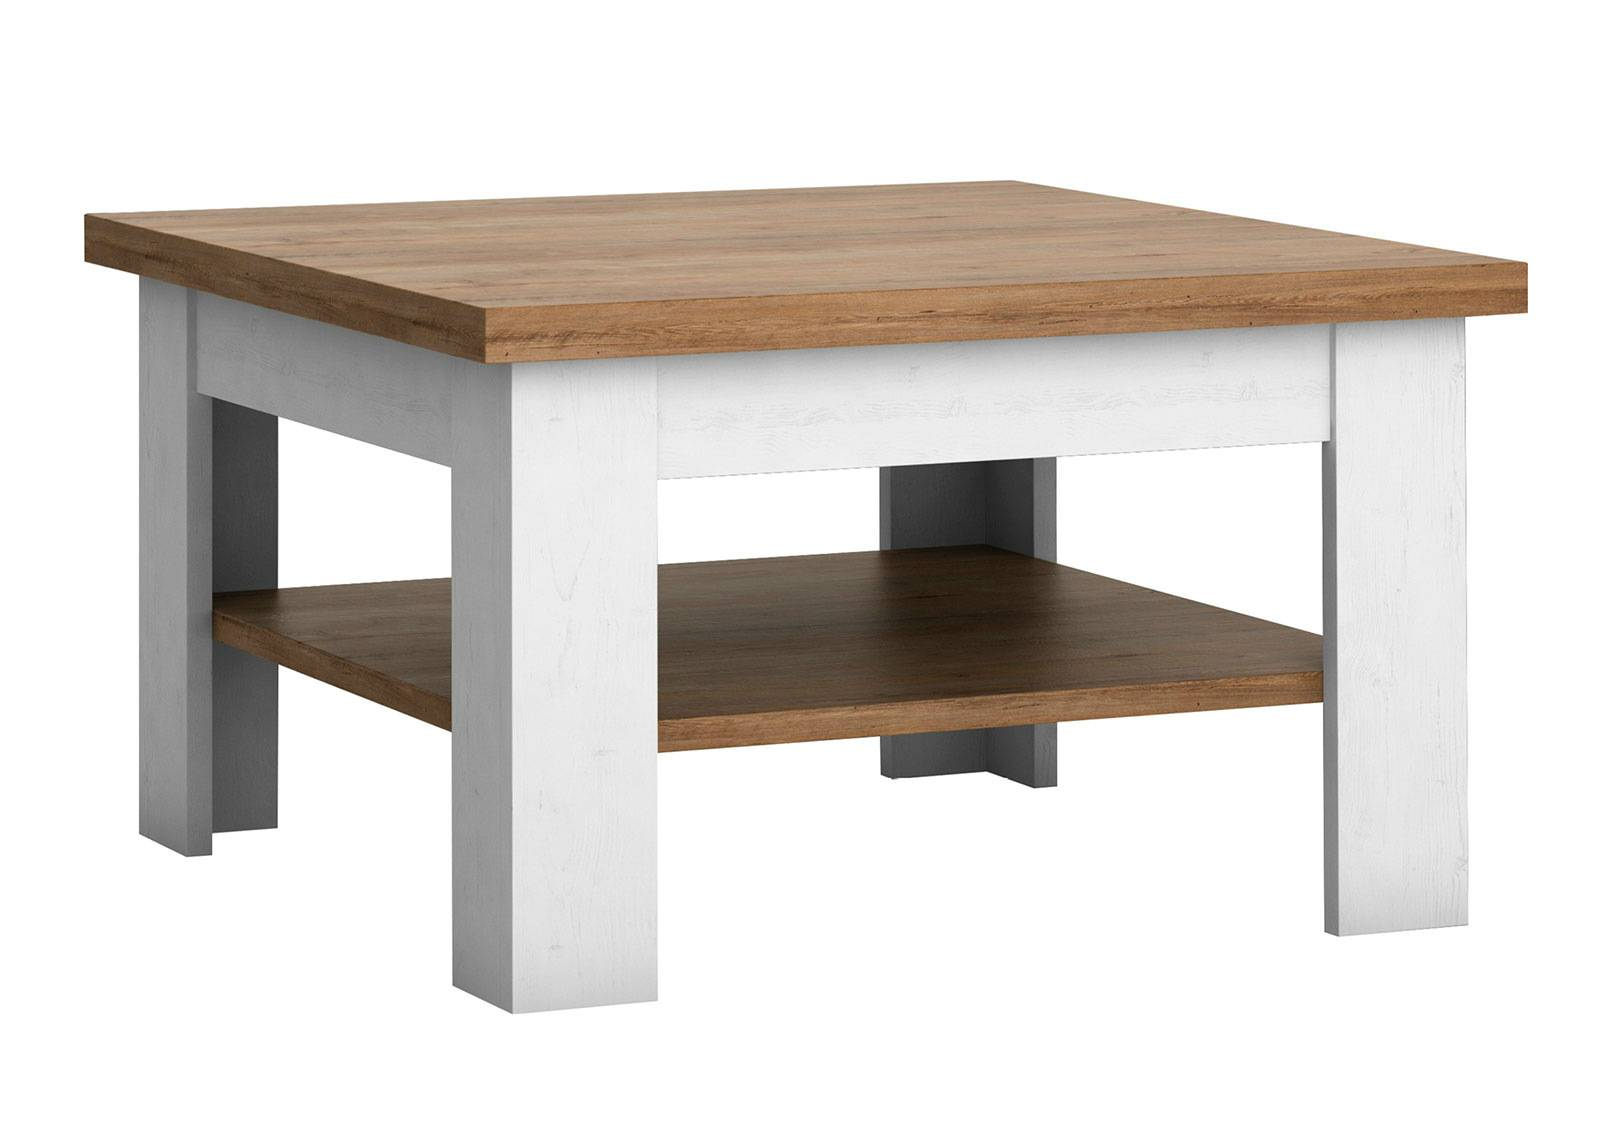 Galameble Sohvapöytä 70x70 cm